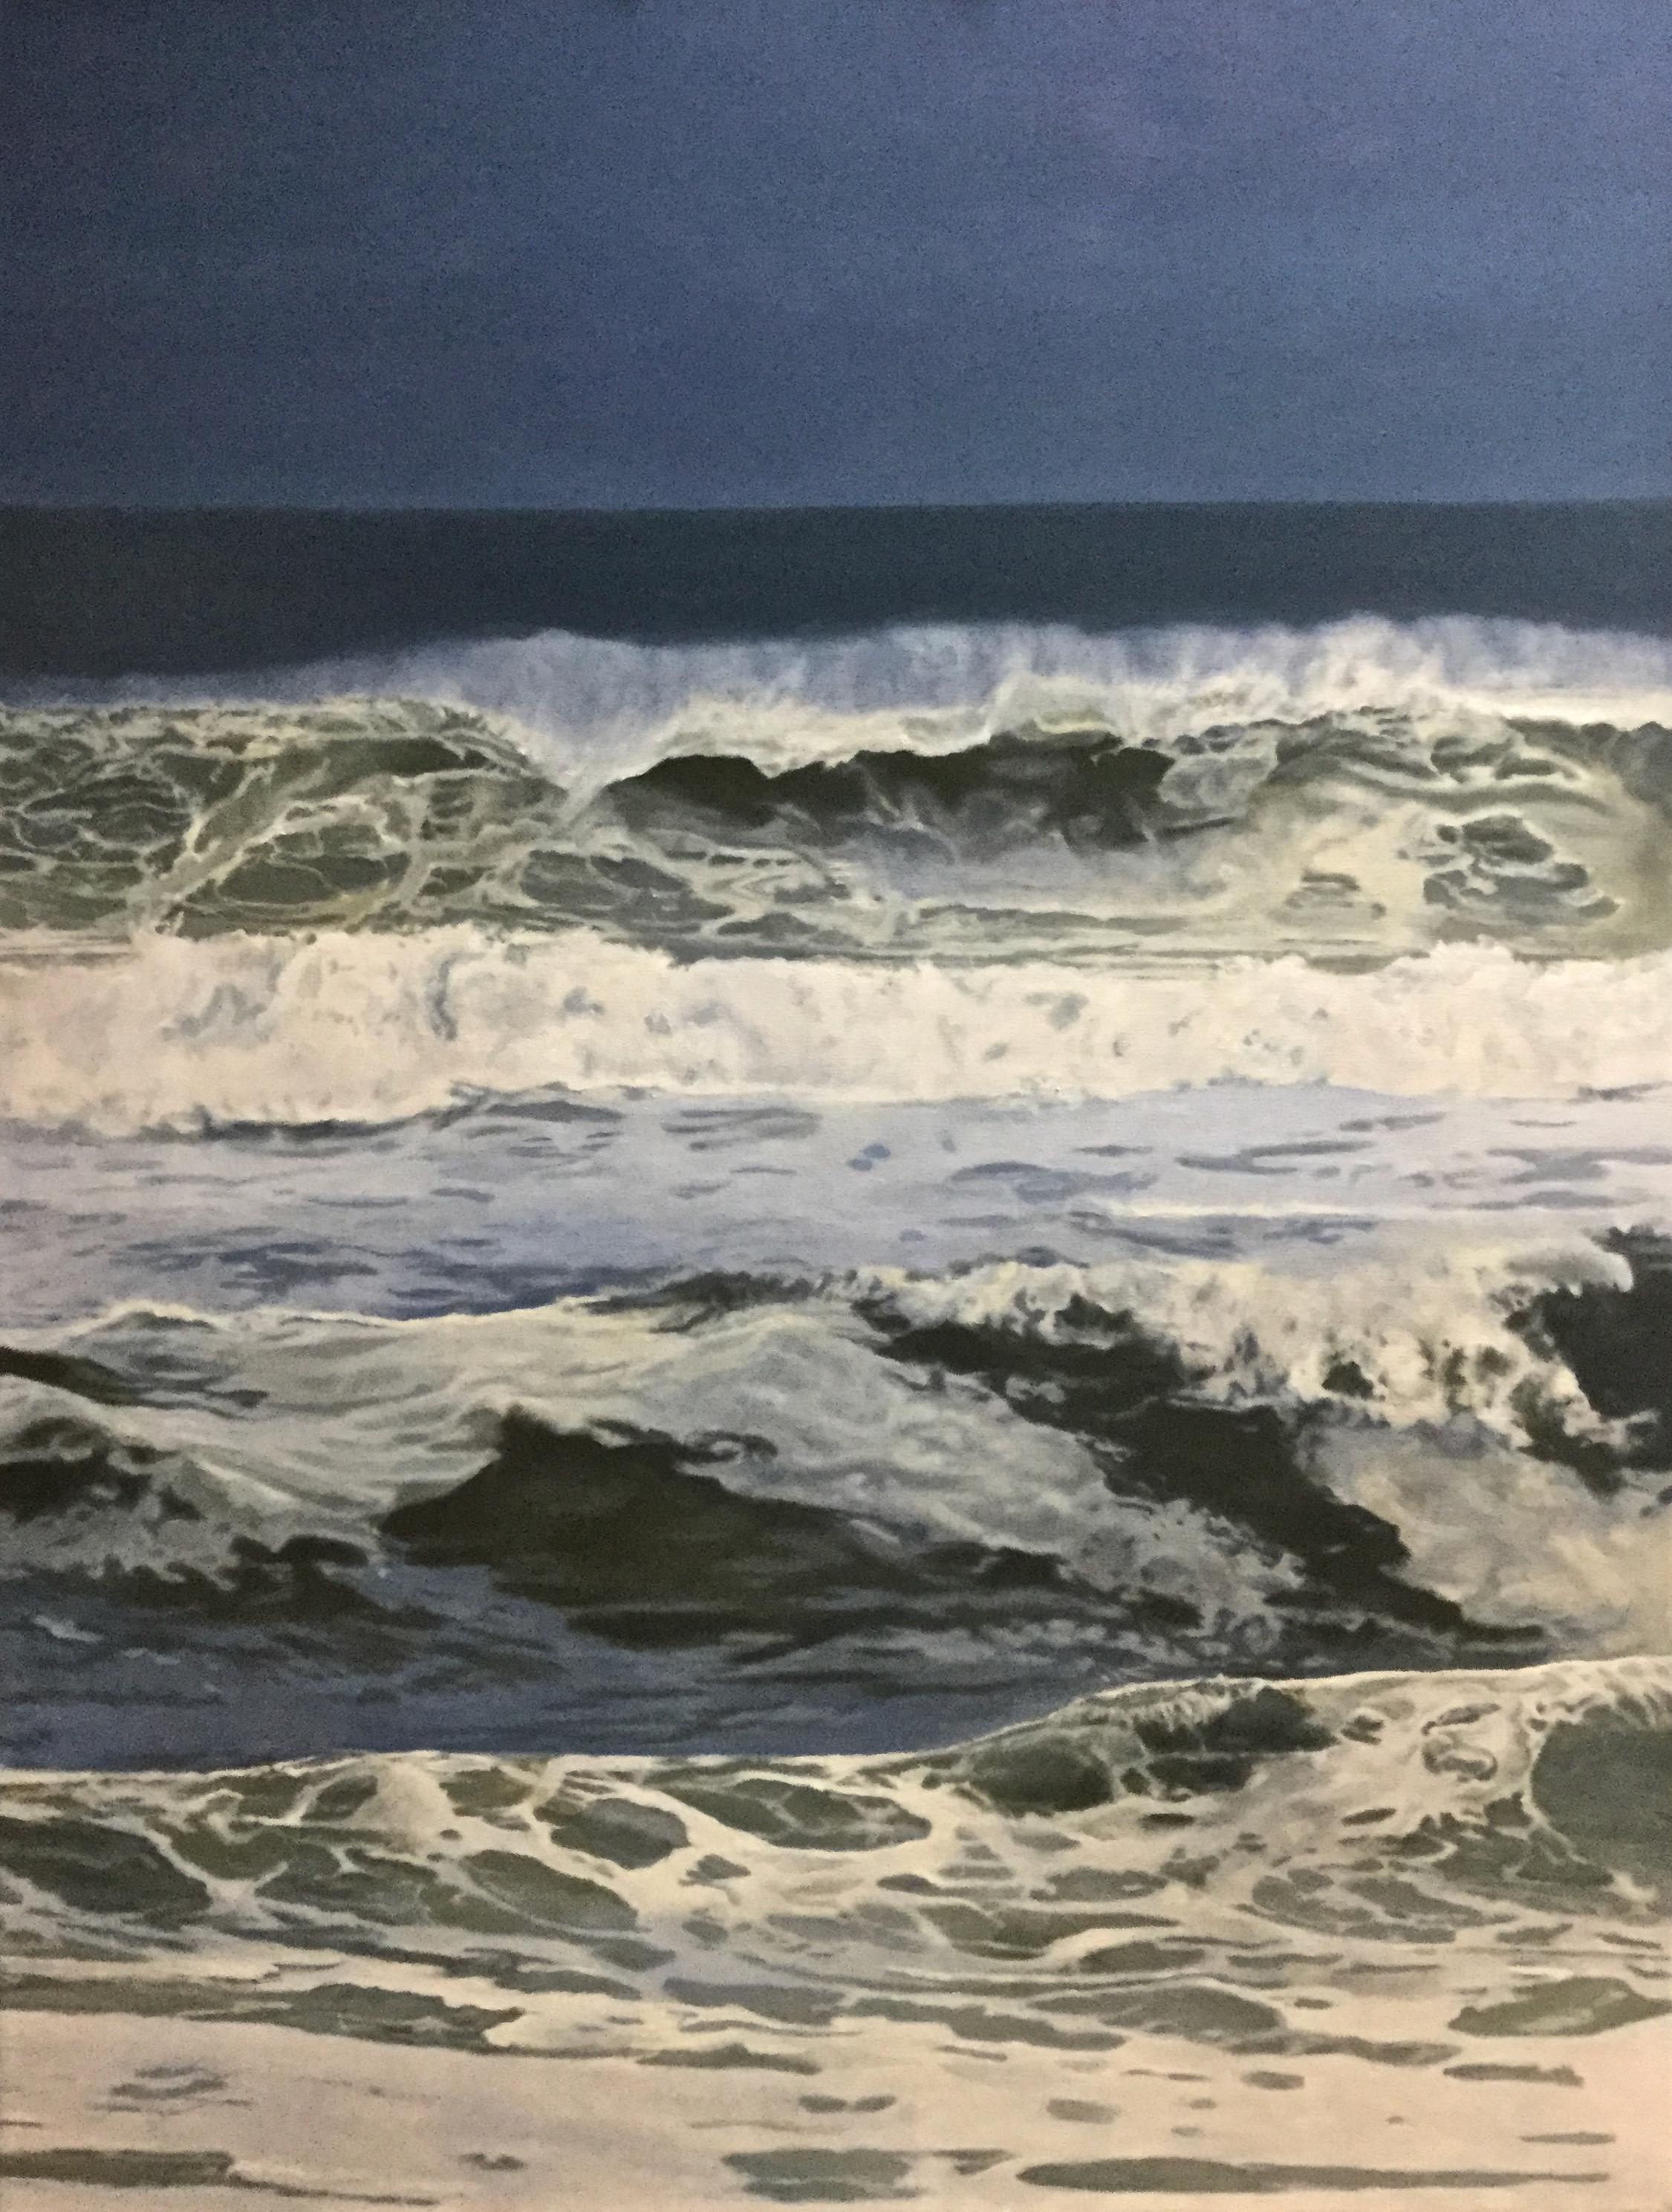 Storm Surf 2017 - Carlsbad